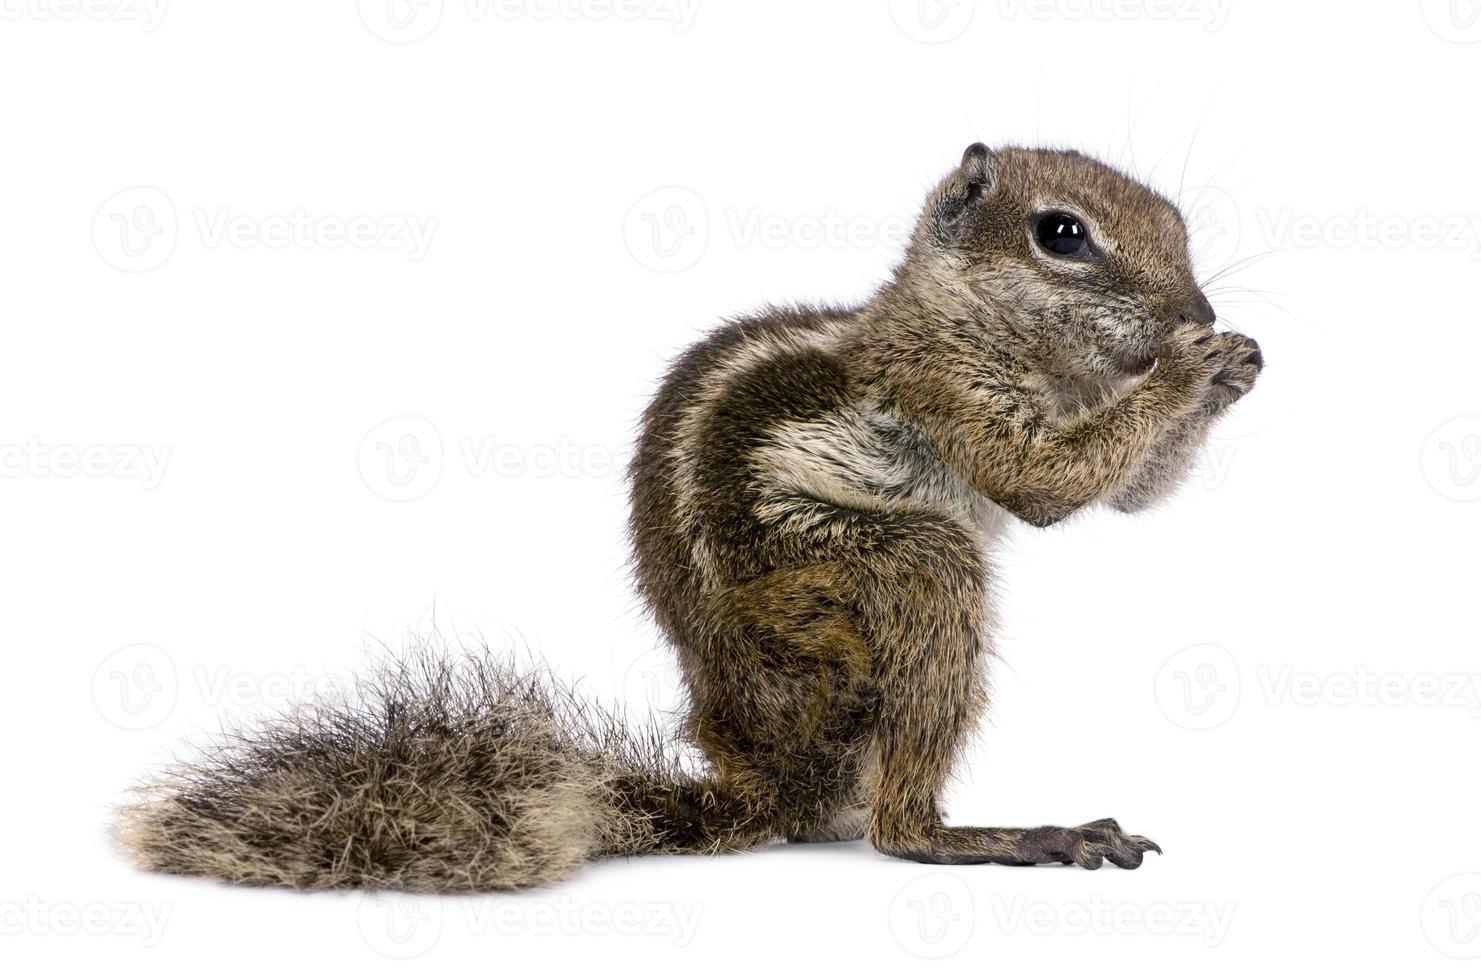 esquilo à terra babary, atlantoxerus getulus, permanente foto